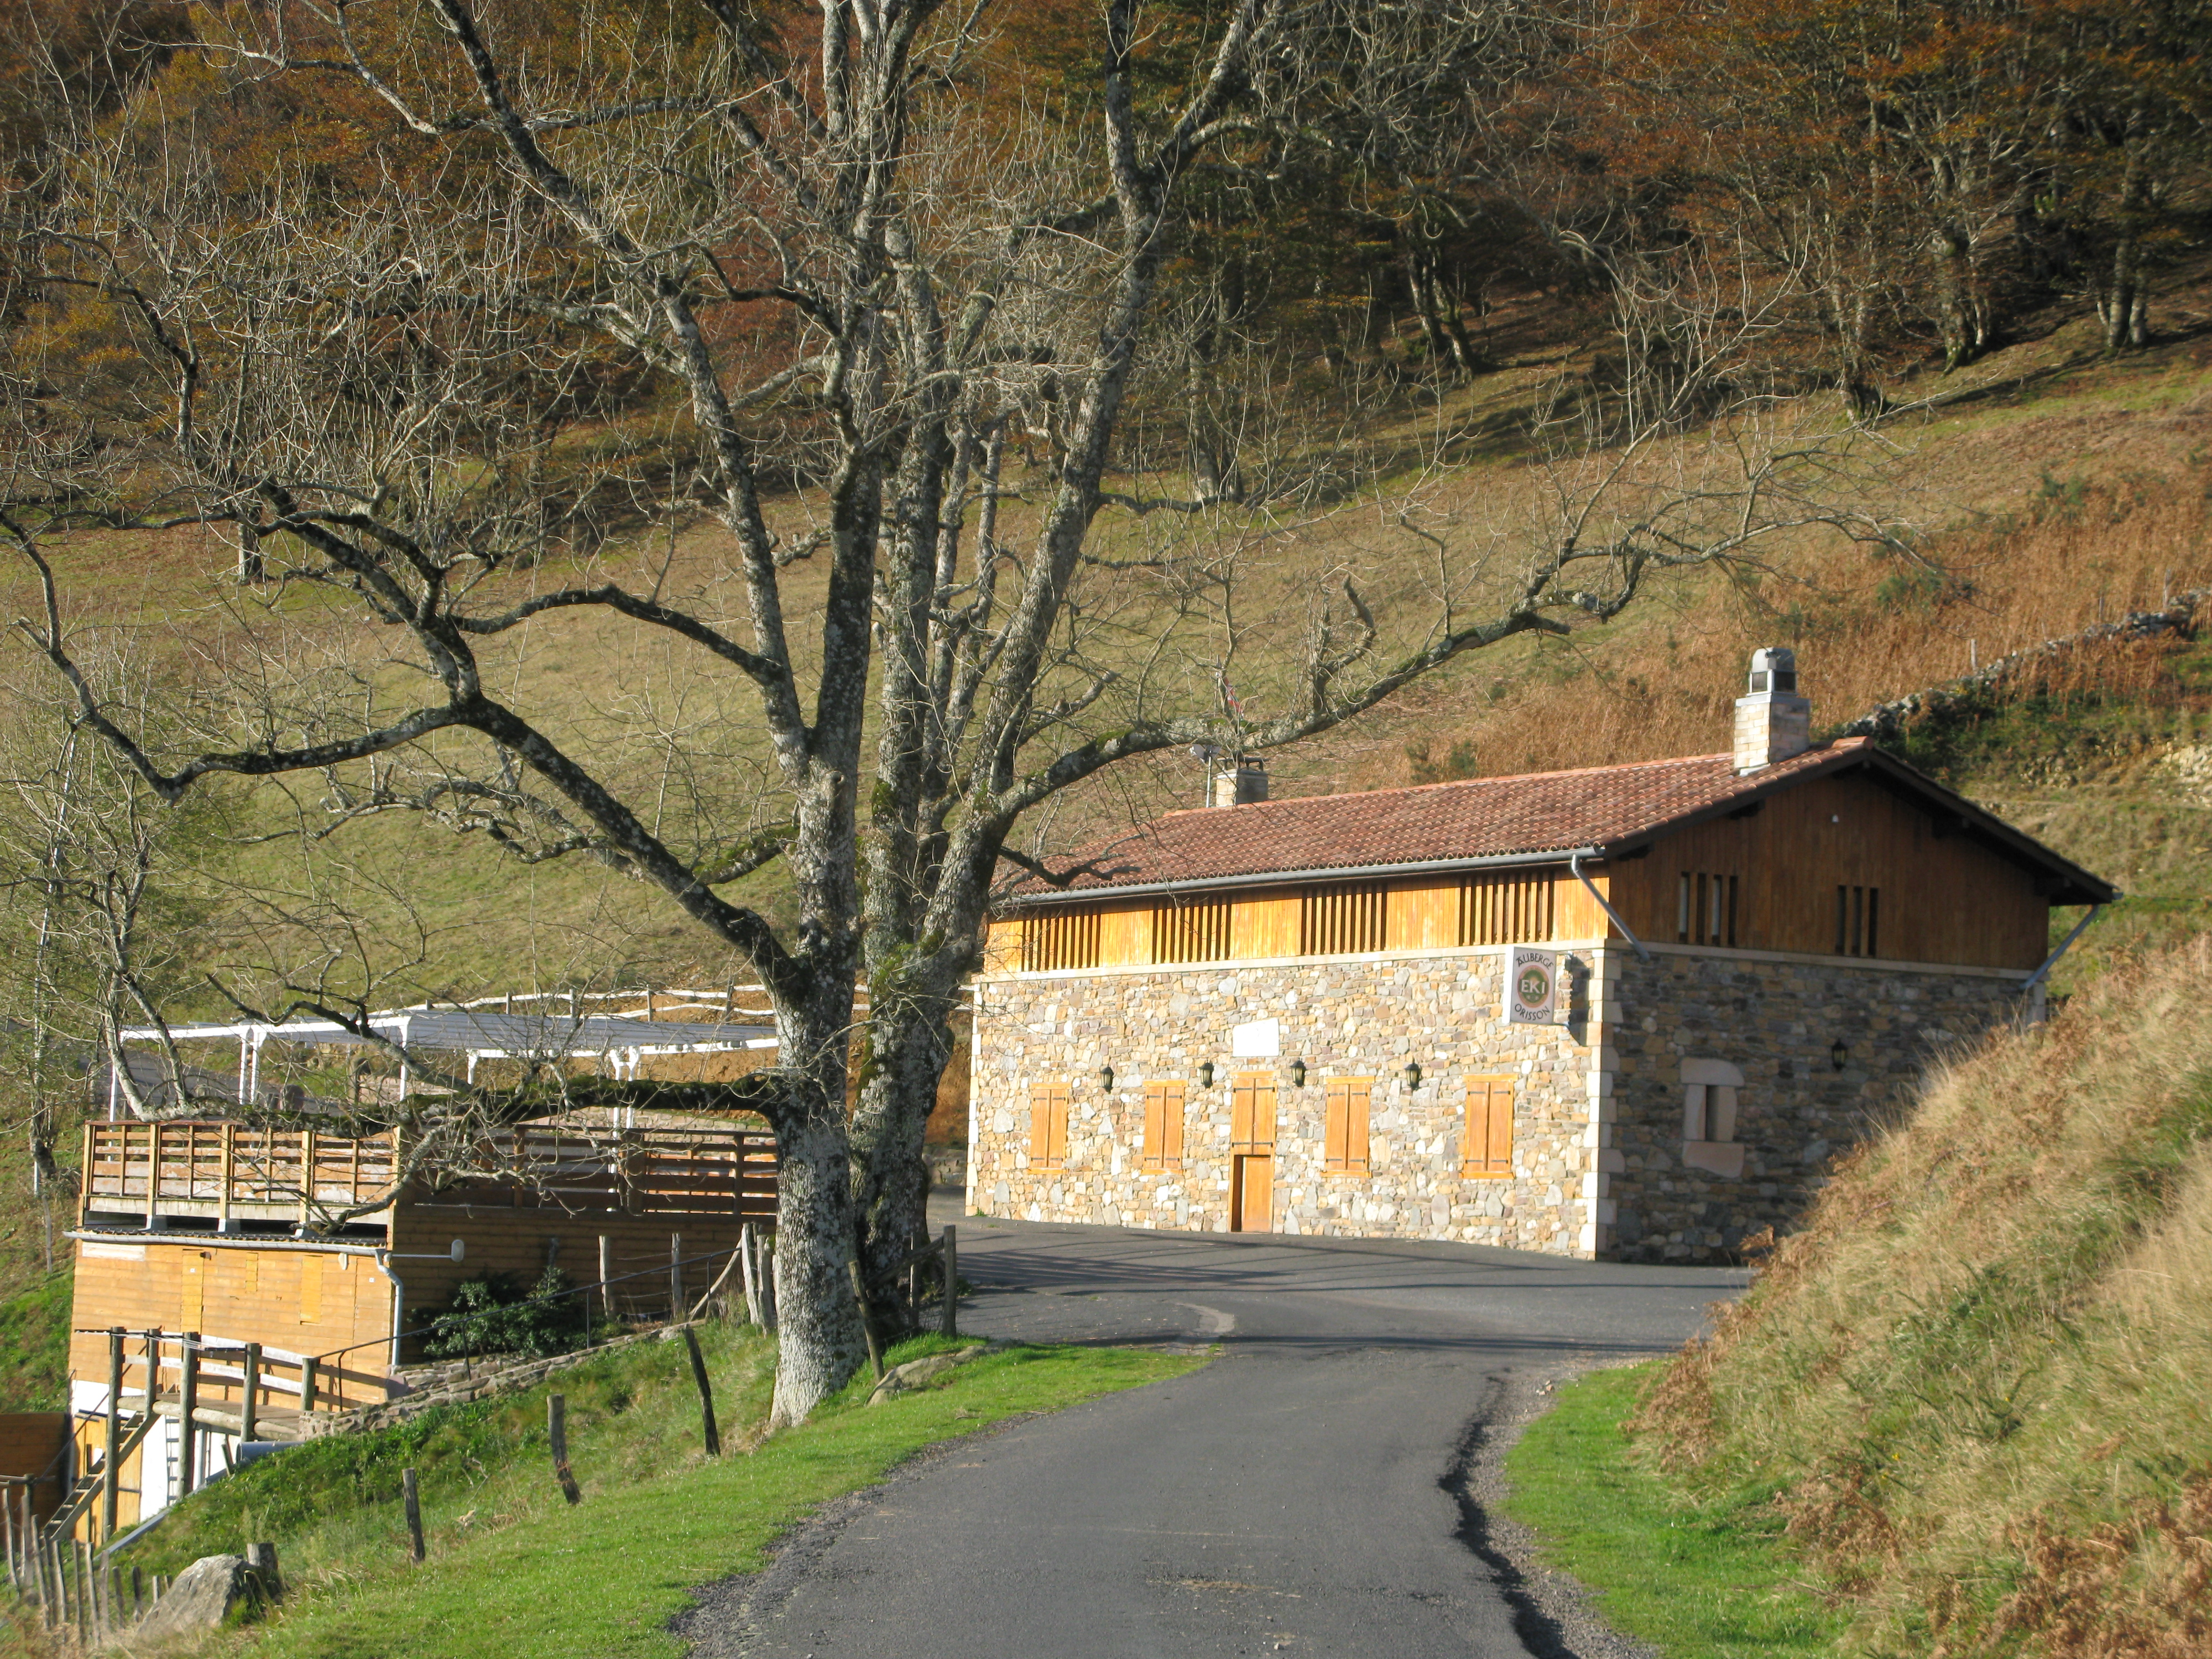 Walking the camino de santiago from saint jean pied de - St jean pied de port to roncesvalles ...